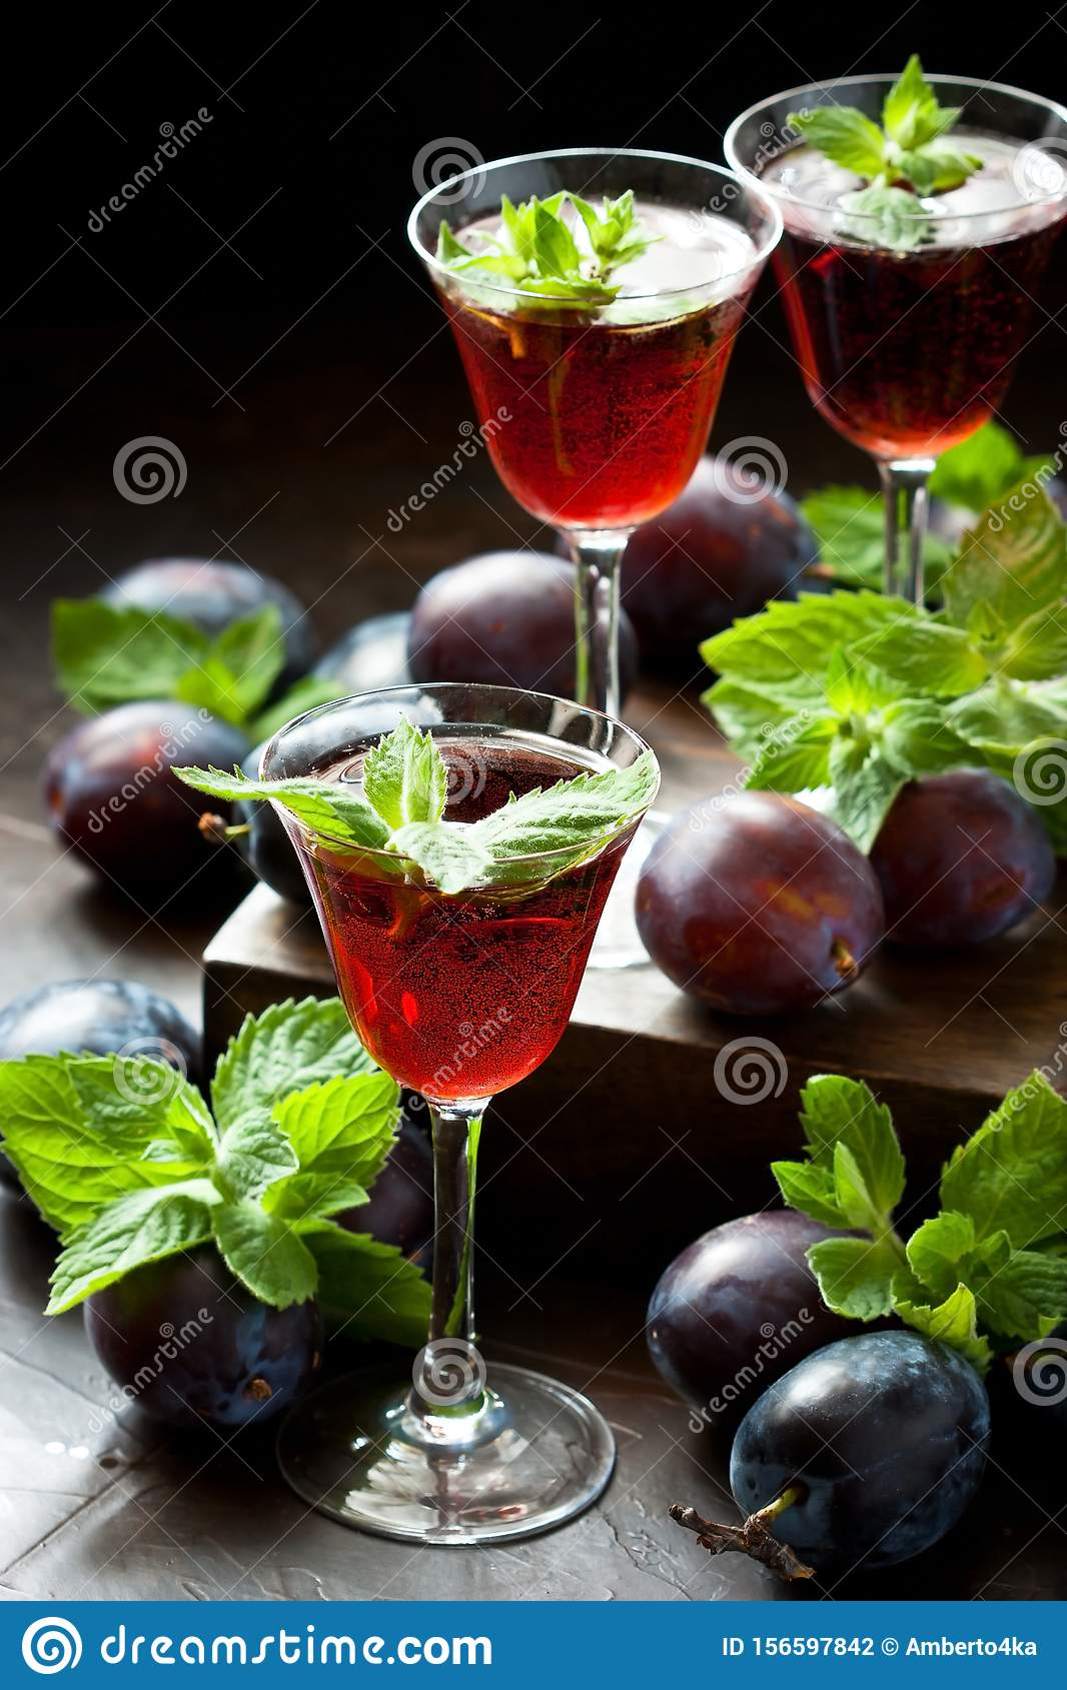 Glasses of fruit liqueur on dark background